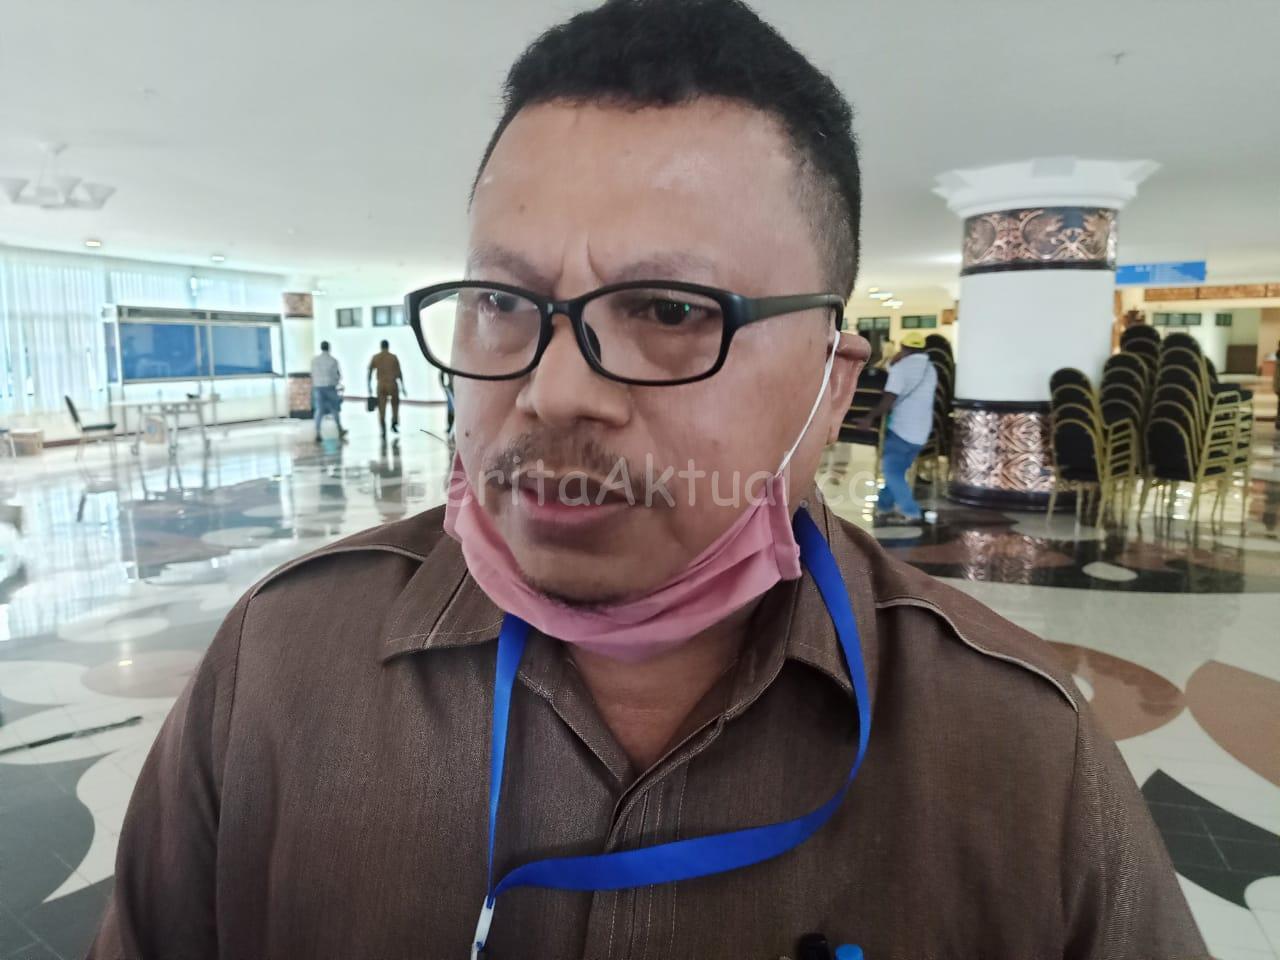 Hampir Sebulan Belum Ada Yang Klaim Sebagai Pencipta Lagu Tanah Papua 7 IMG 20200610 WA0023